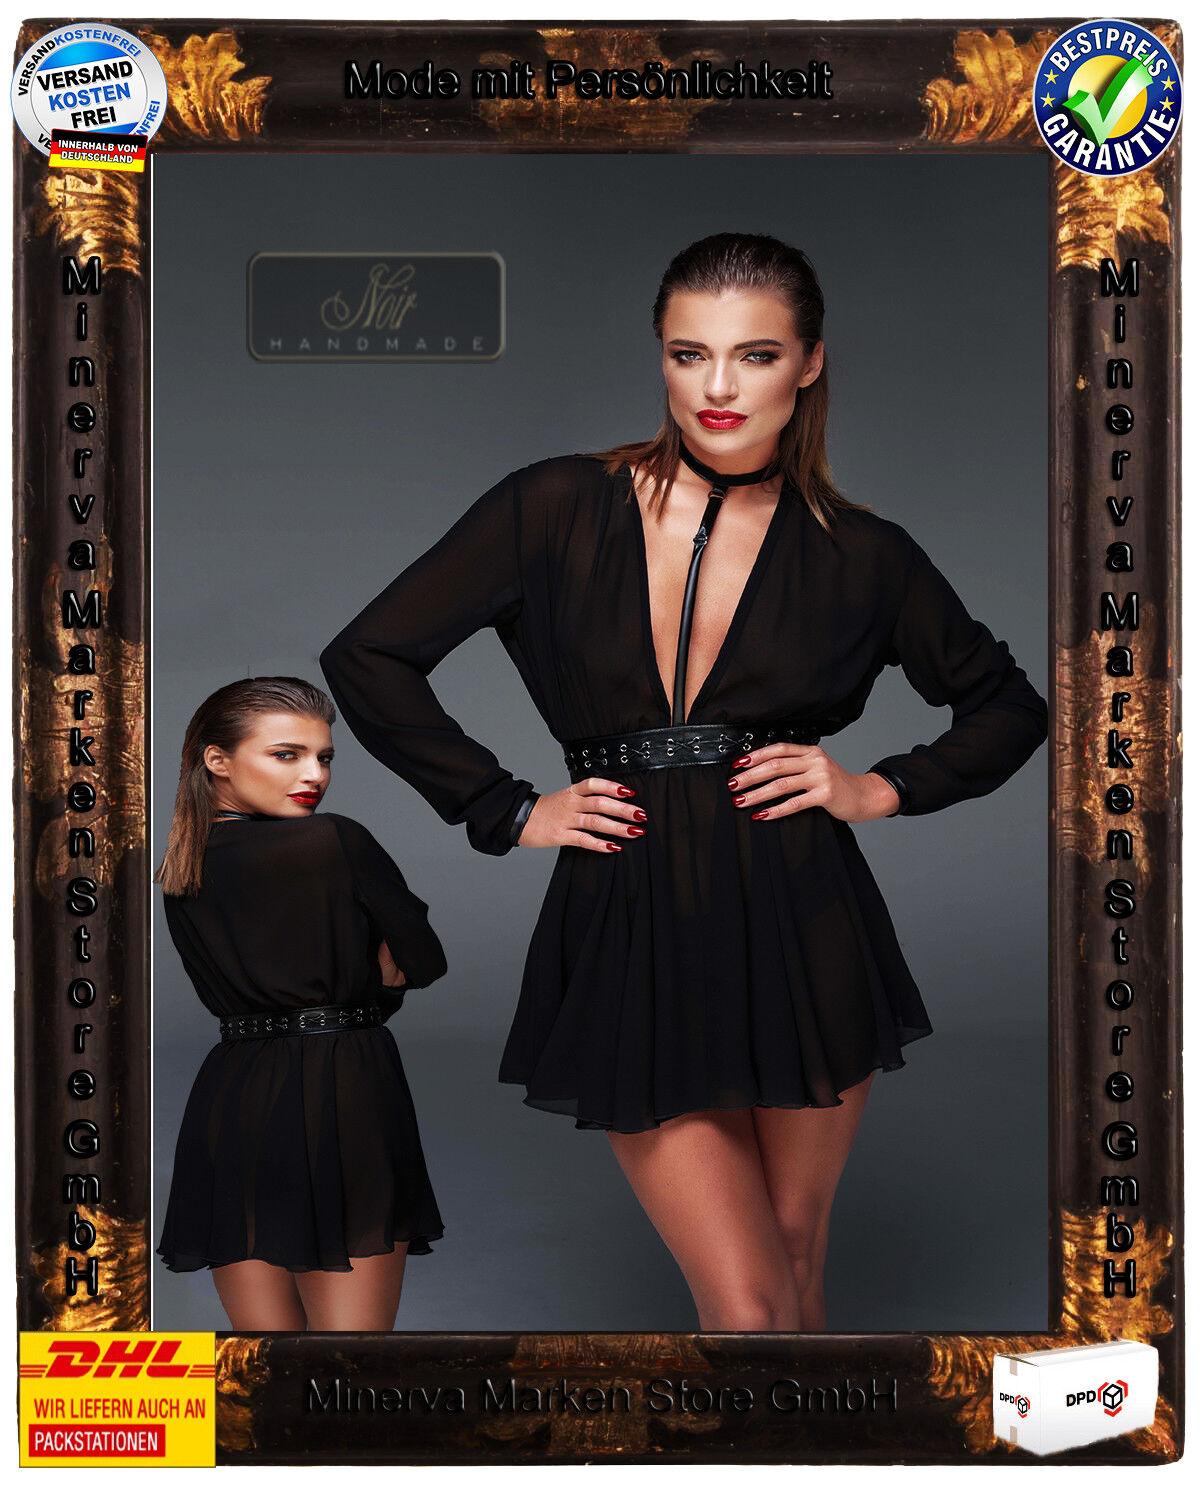 schwarz Handmade Chiffon Wetlook Minikleid  F150 F150 F150 Choker Clubwear Gothic Transparent 088127